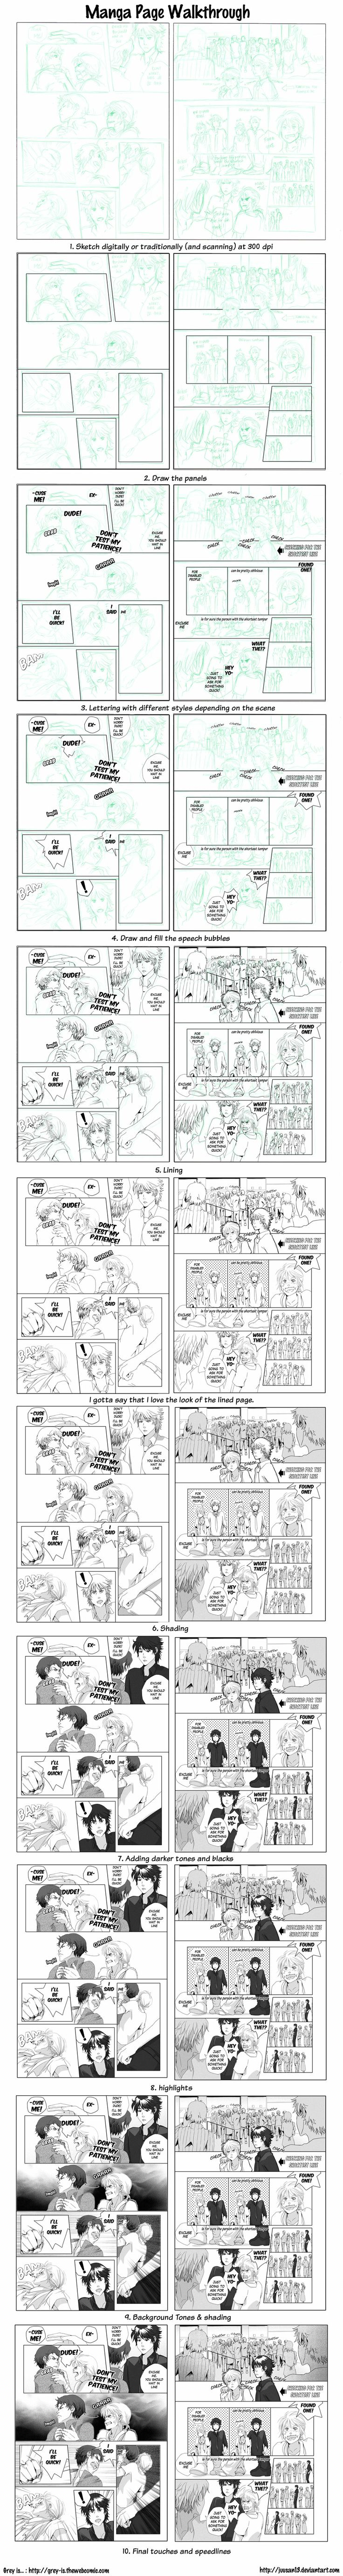 Manga Page Process by =deeJuusan on deviantART